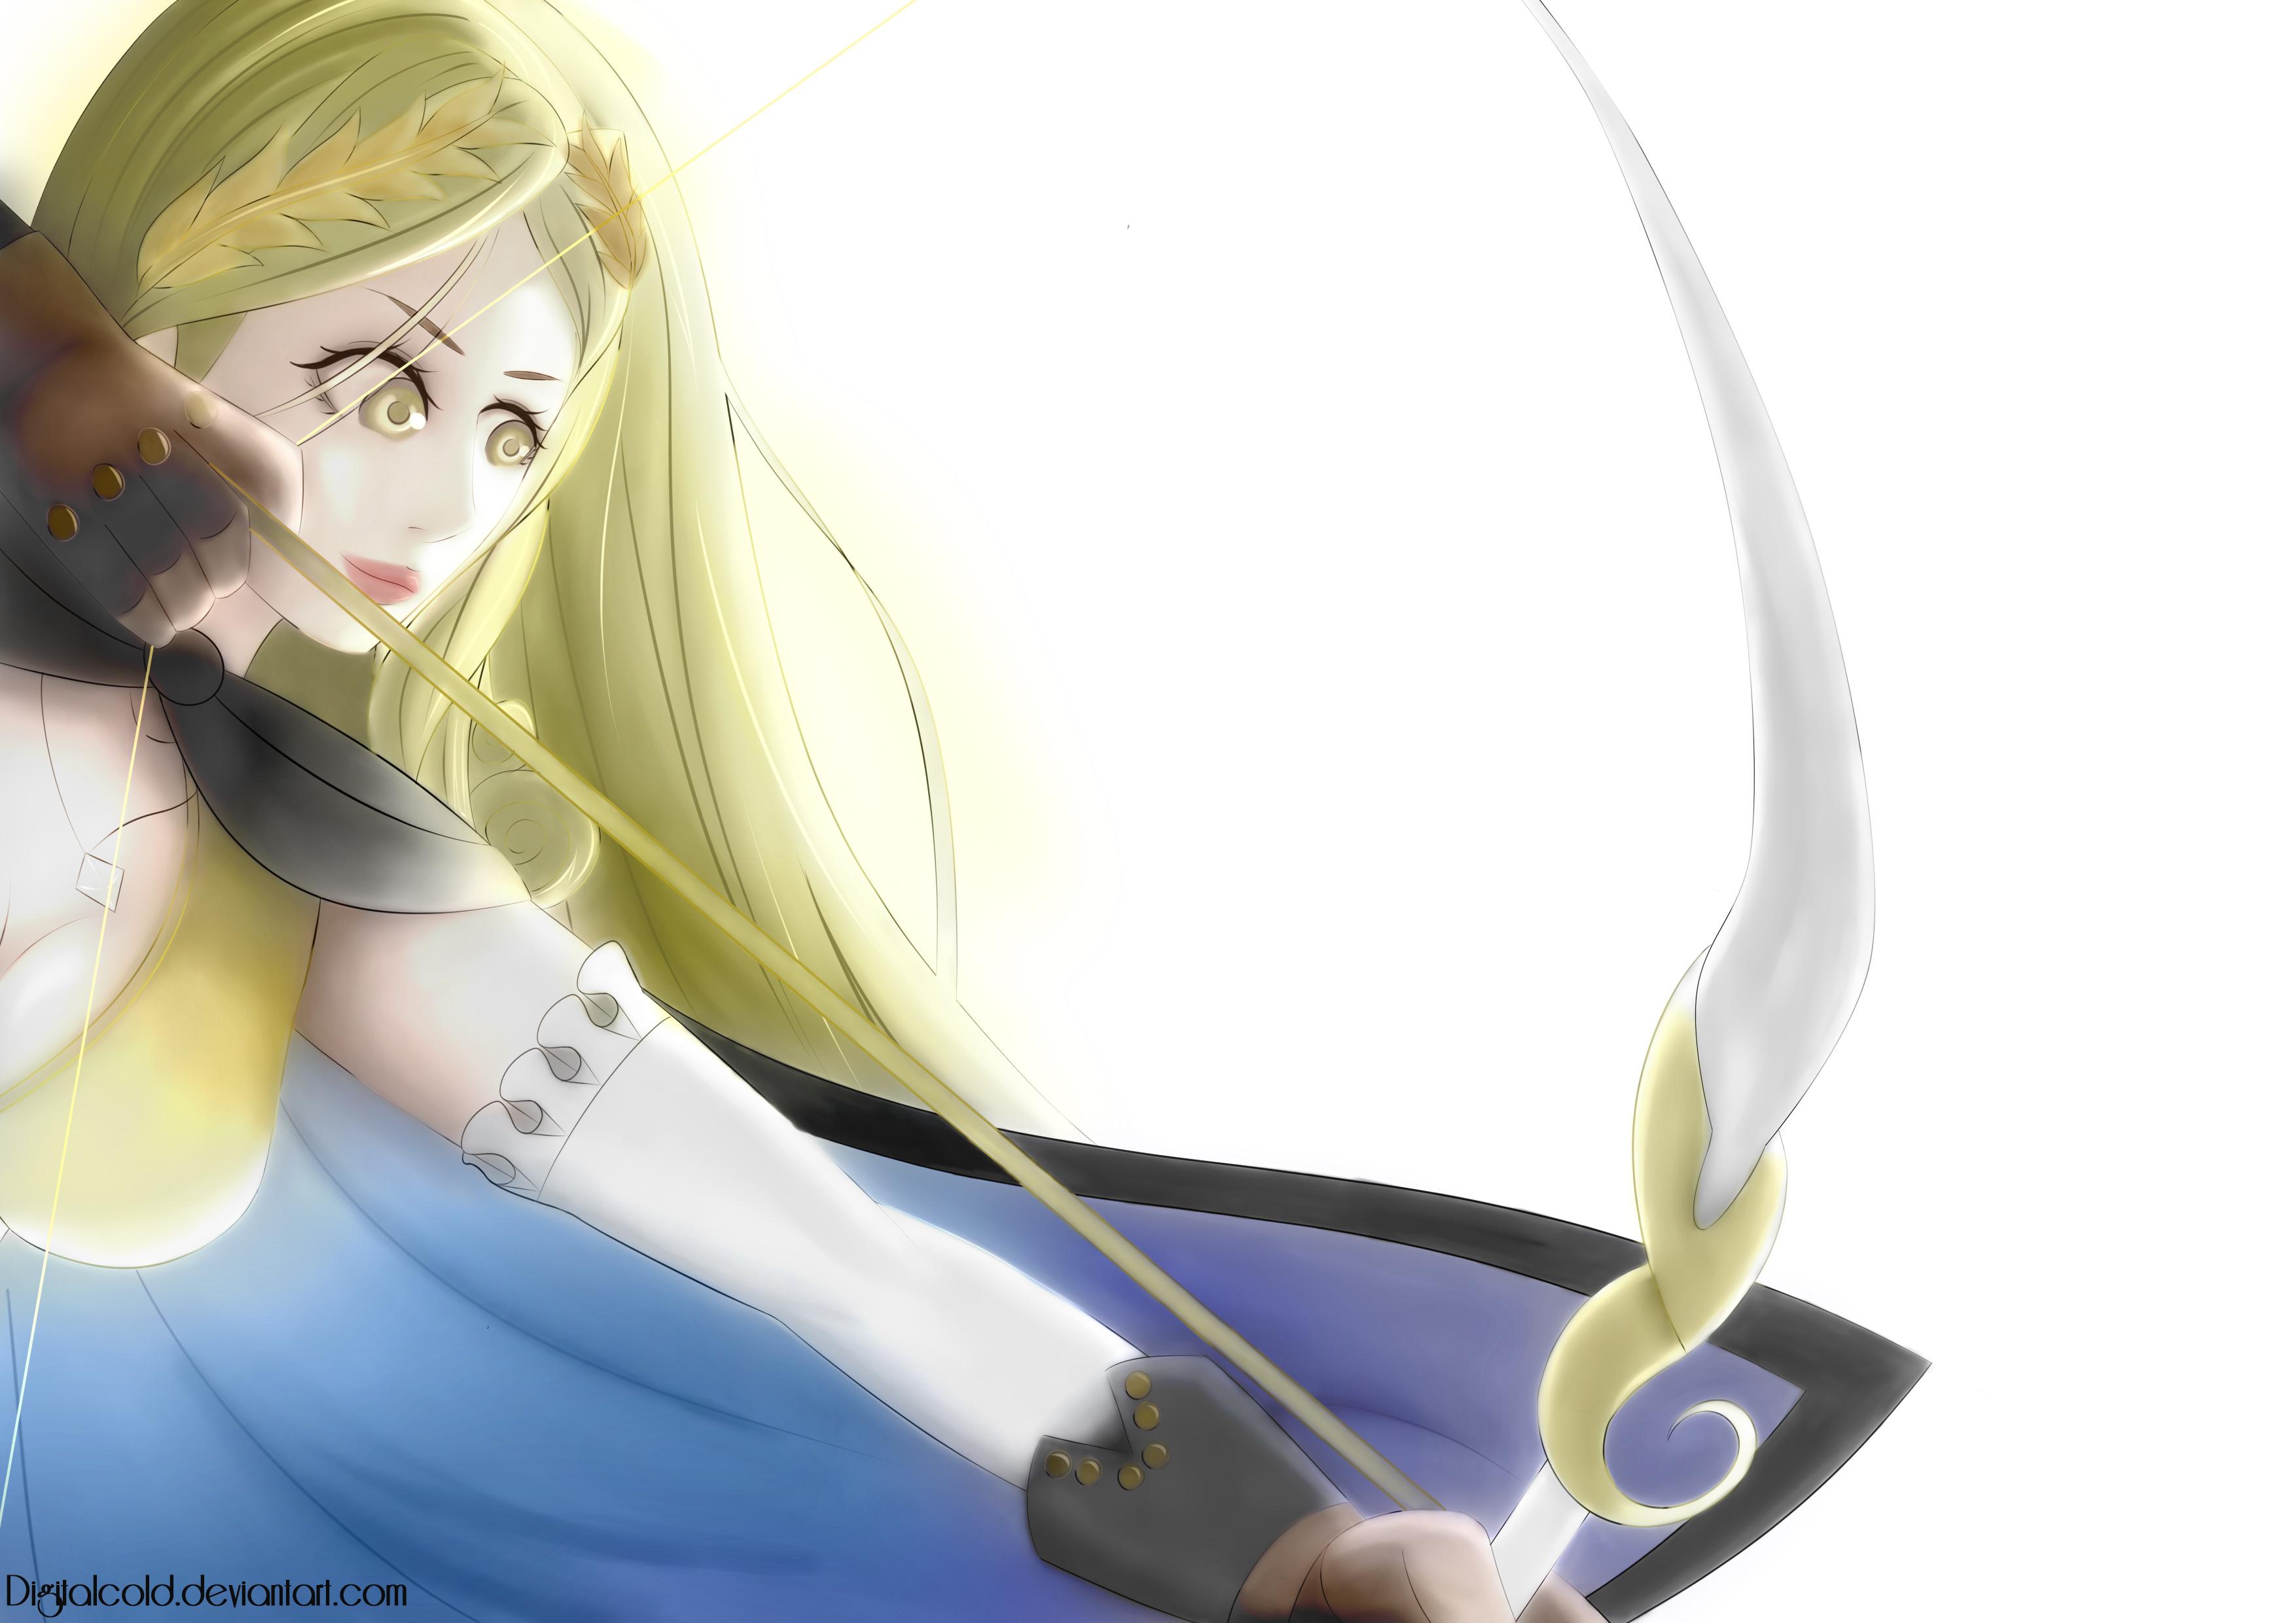 Uriella - Child of light